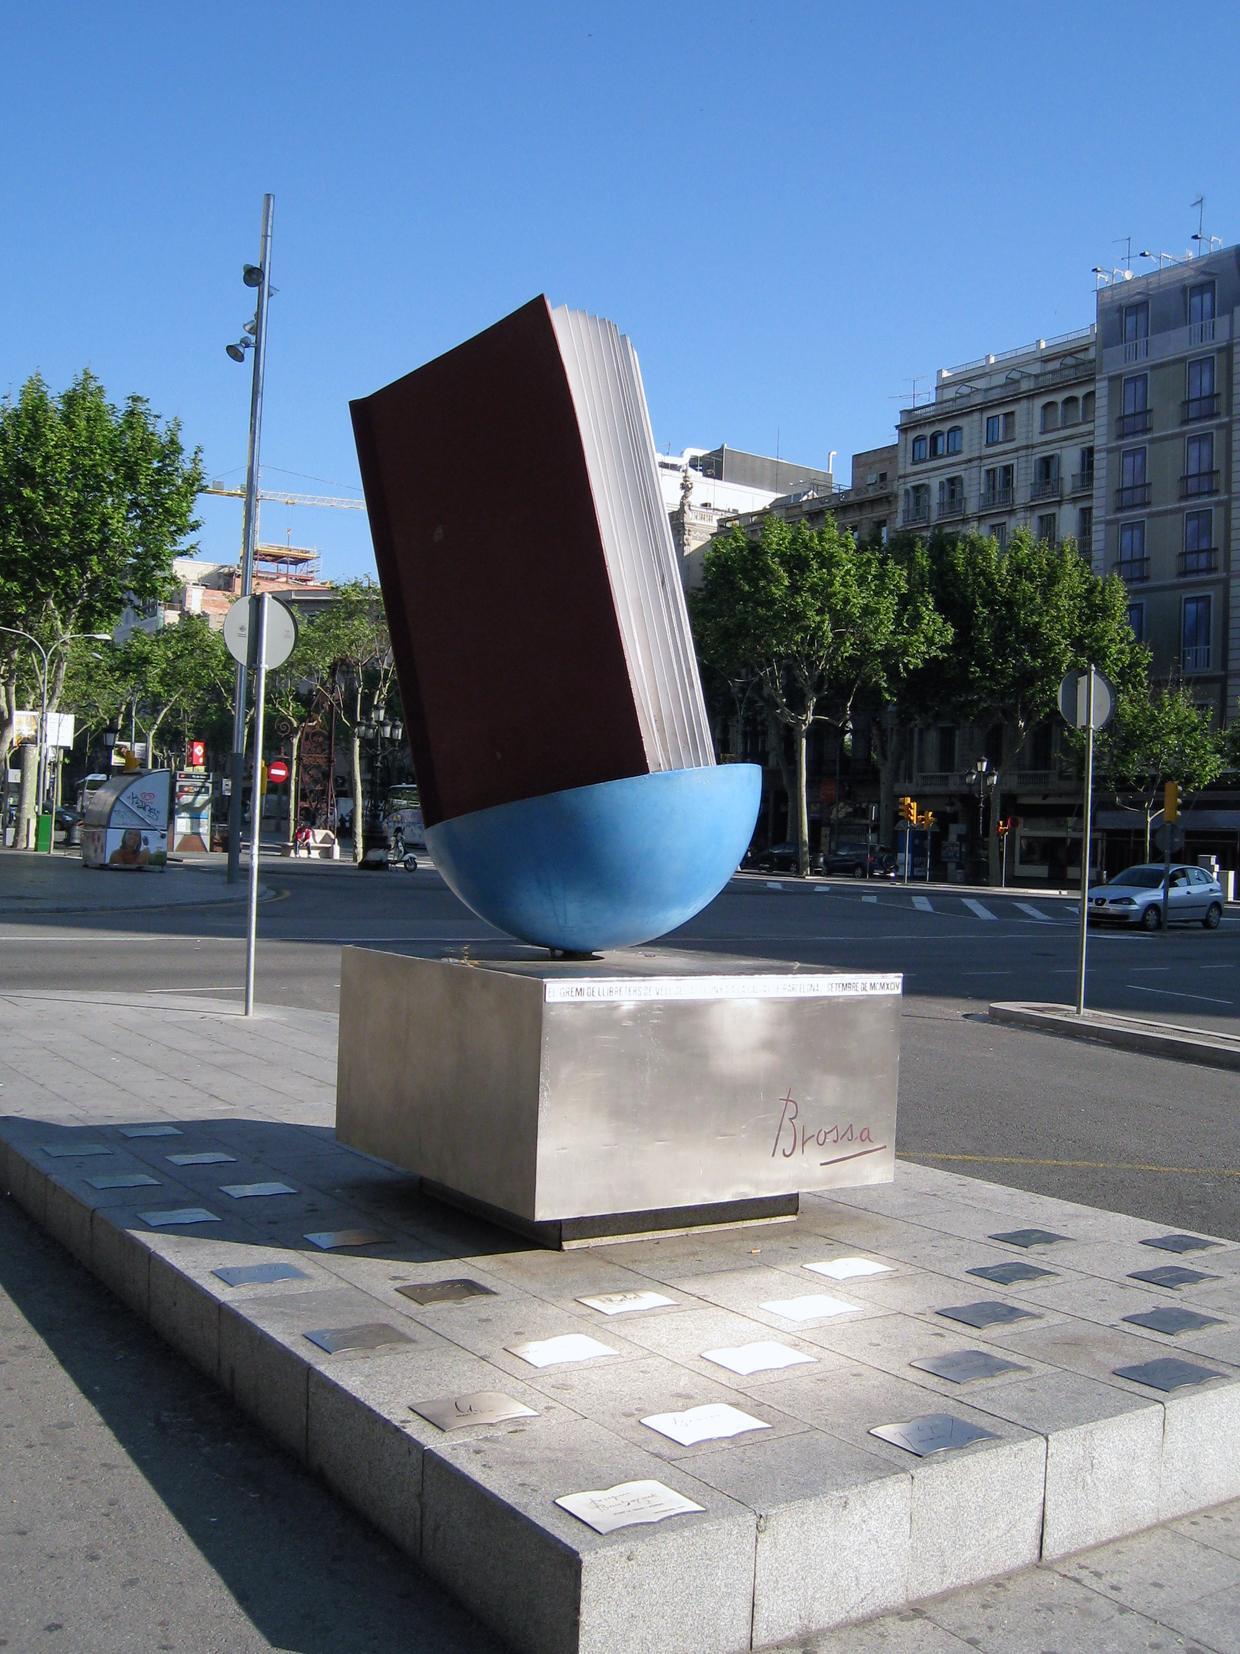 Joan Brossa: Homenatge al llibre, poema urbano. Barcelona, cruce entre Paseo de Gracia / Gran Vía